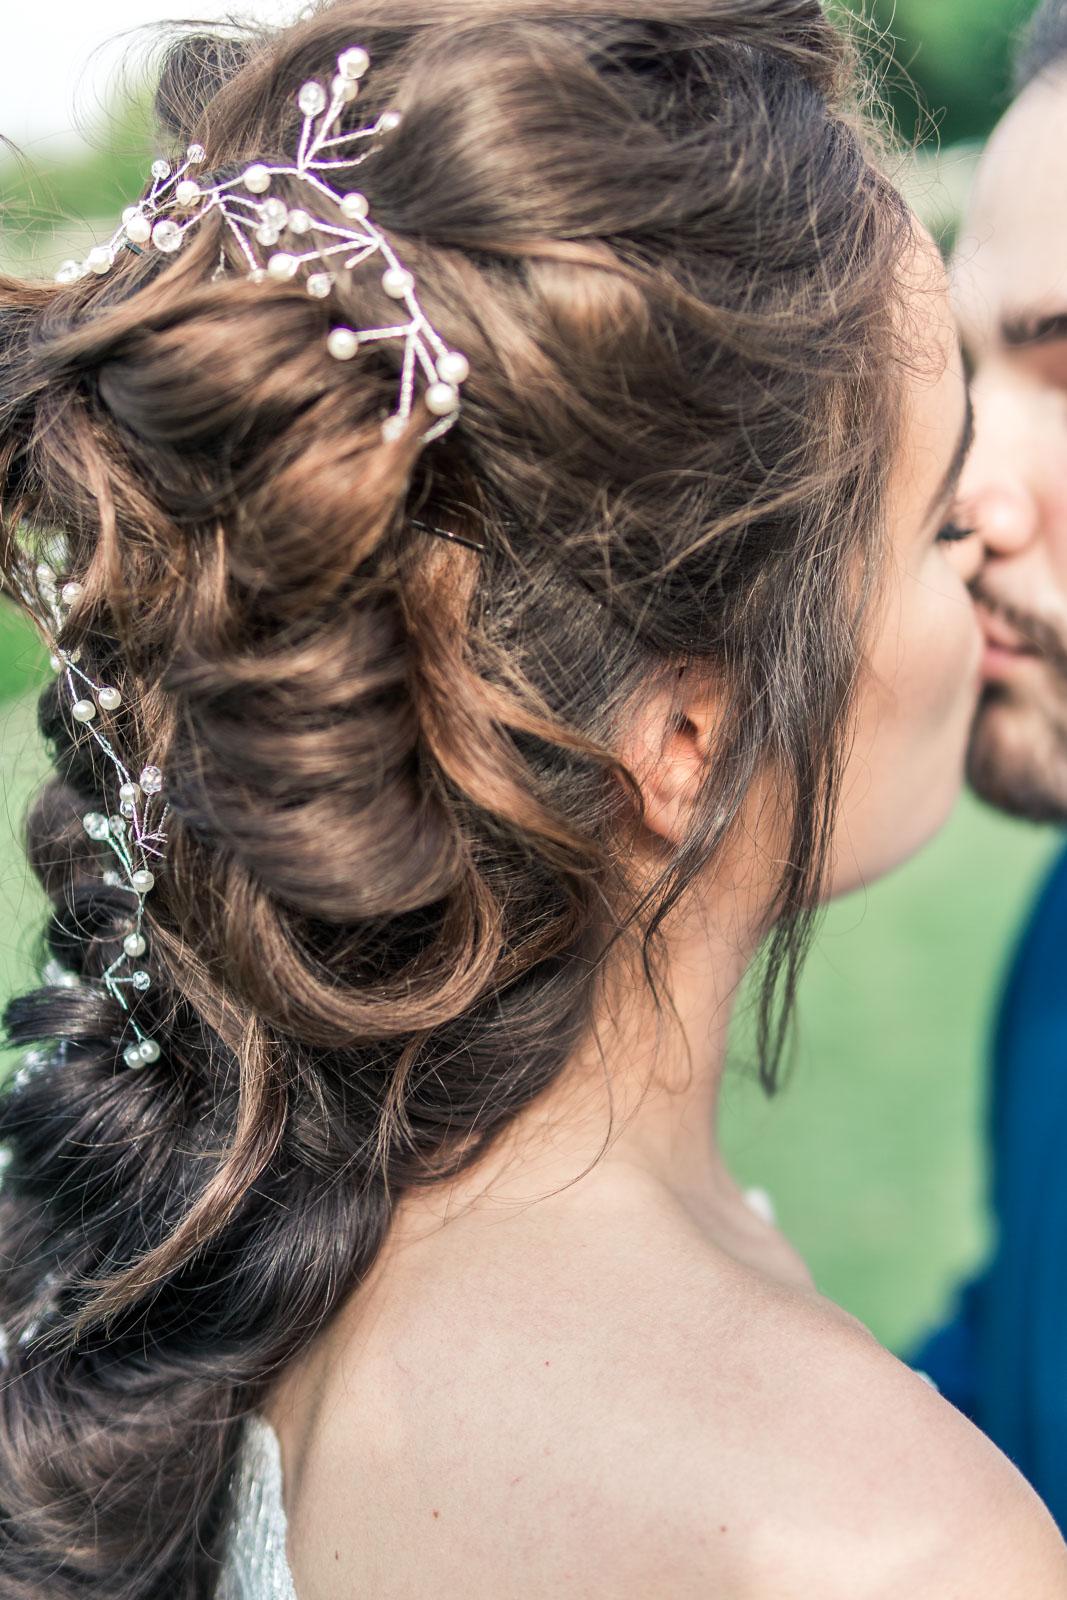 70_Angel-Brea-Orange-County_Joseph-Barber-Wedding-Photography.jpg